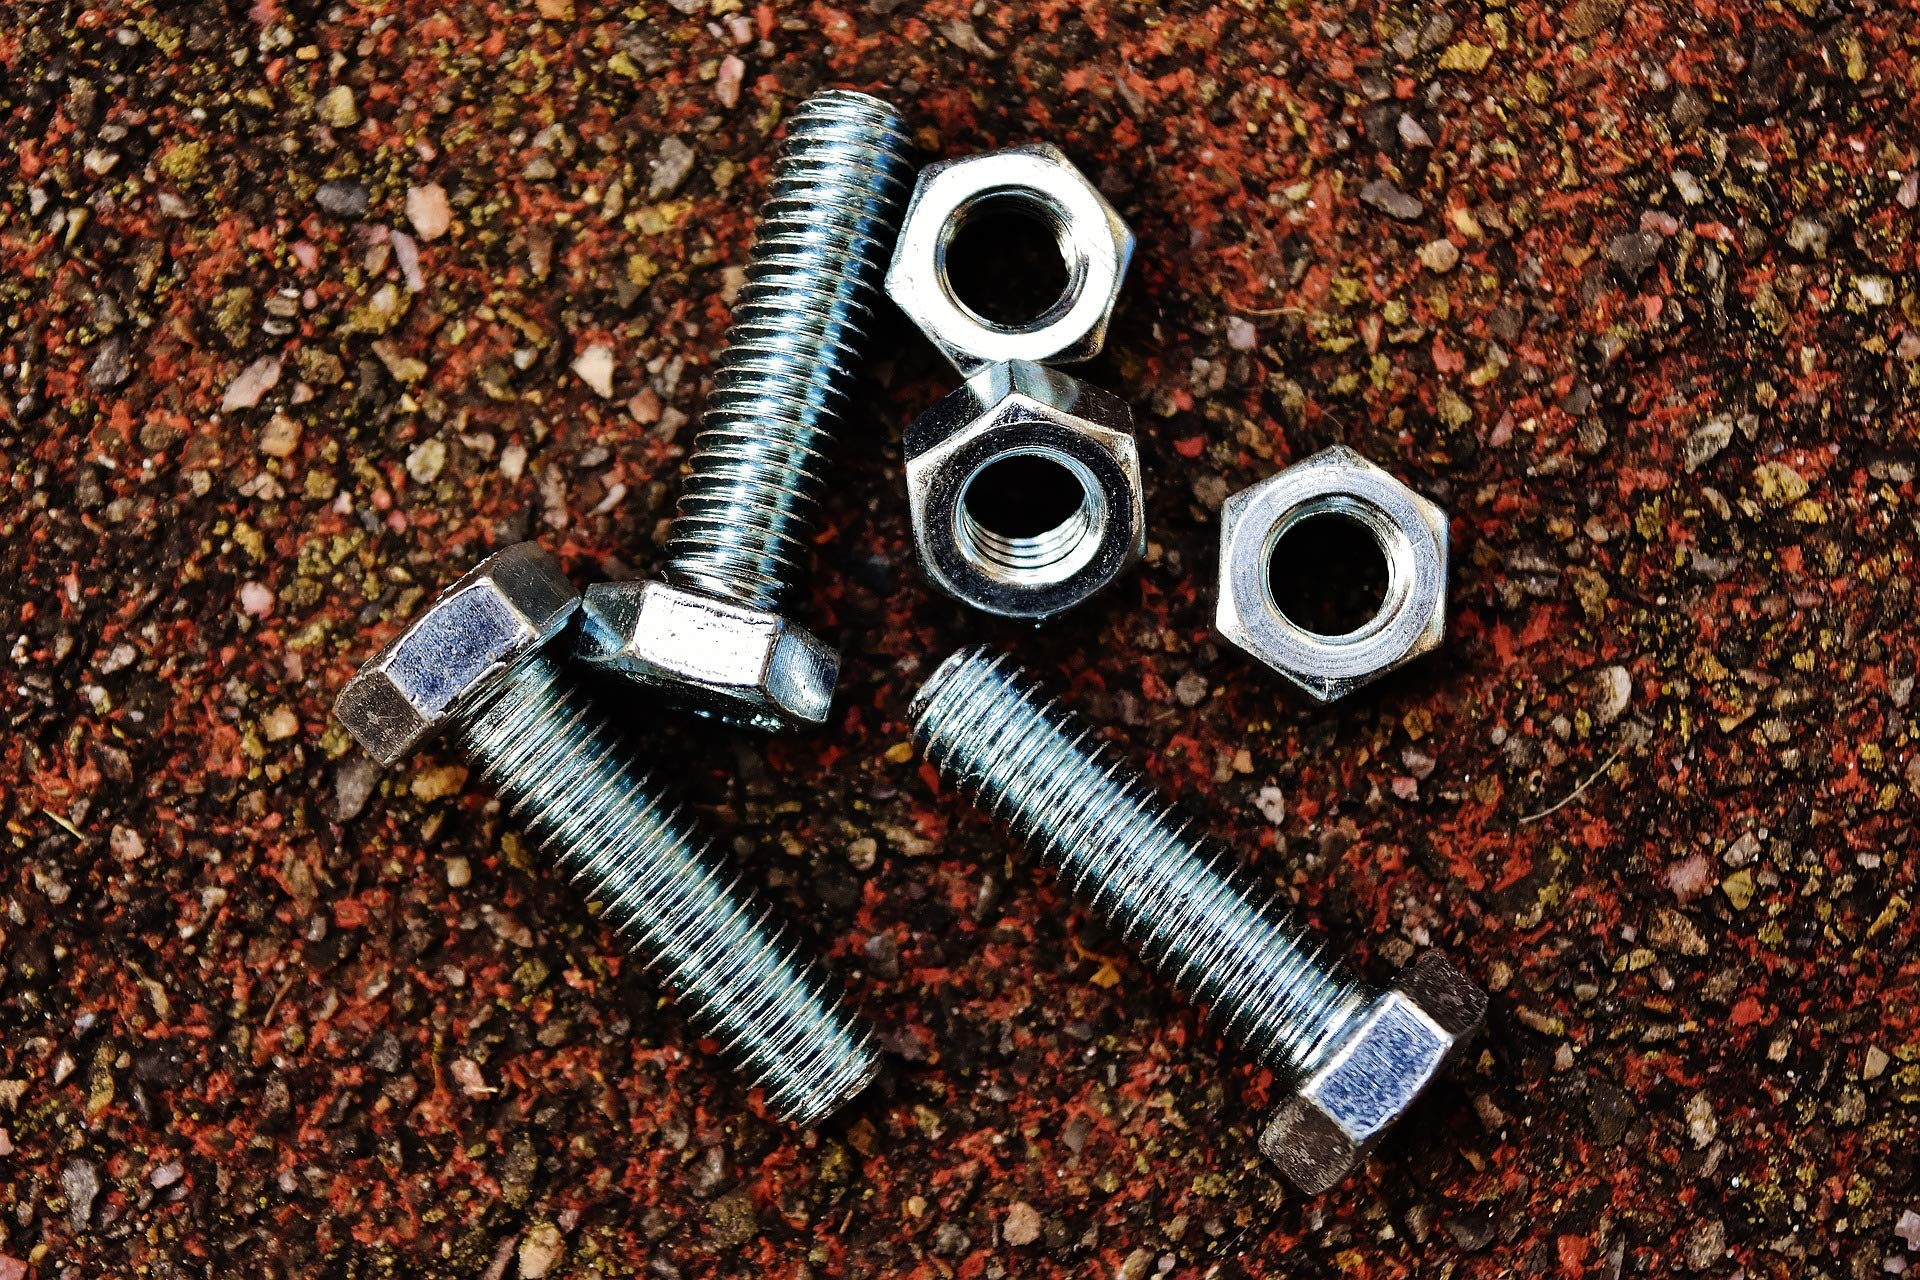 Ruddman Supplies - SAE Standard Assorted Nut and Bolt Hardware Set with Hard Plastic Organizing Case - 240 Piece Set by Ruddman Supplies (Image #5)